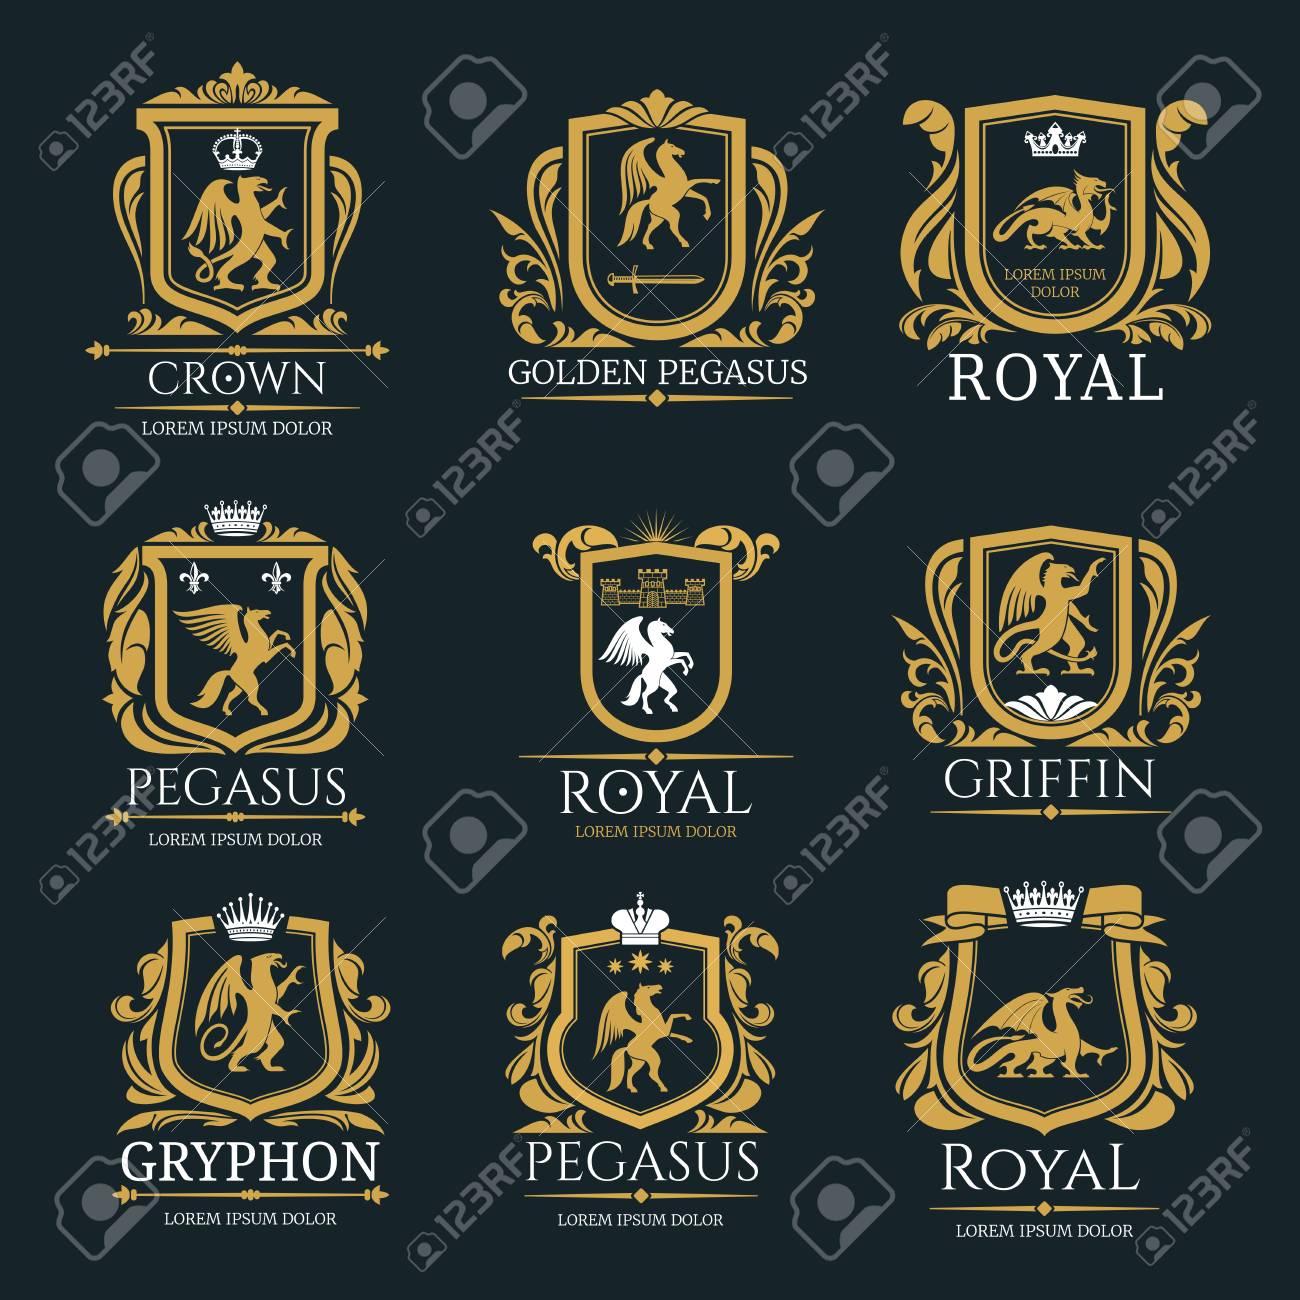 Heraldic royal animals vector isolated icons - 104011872